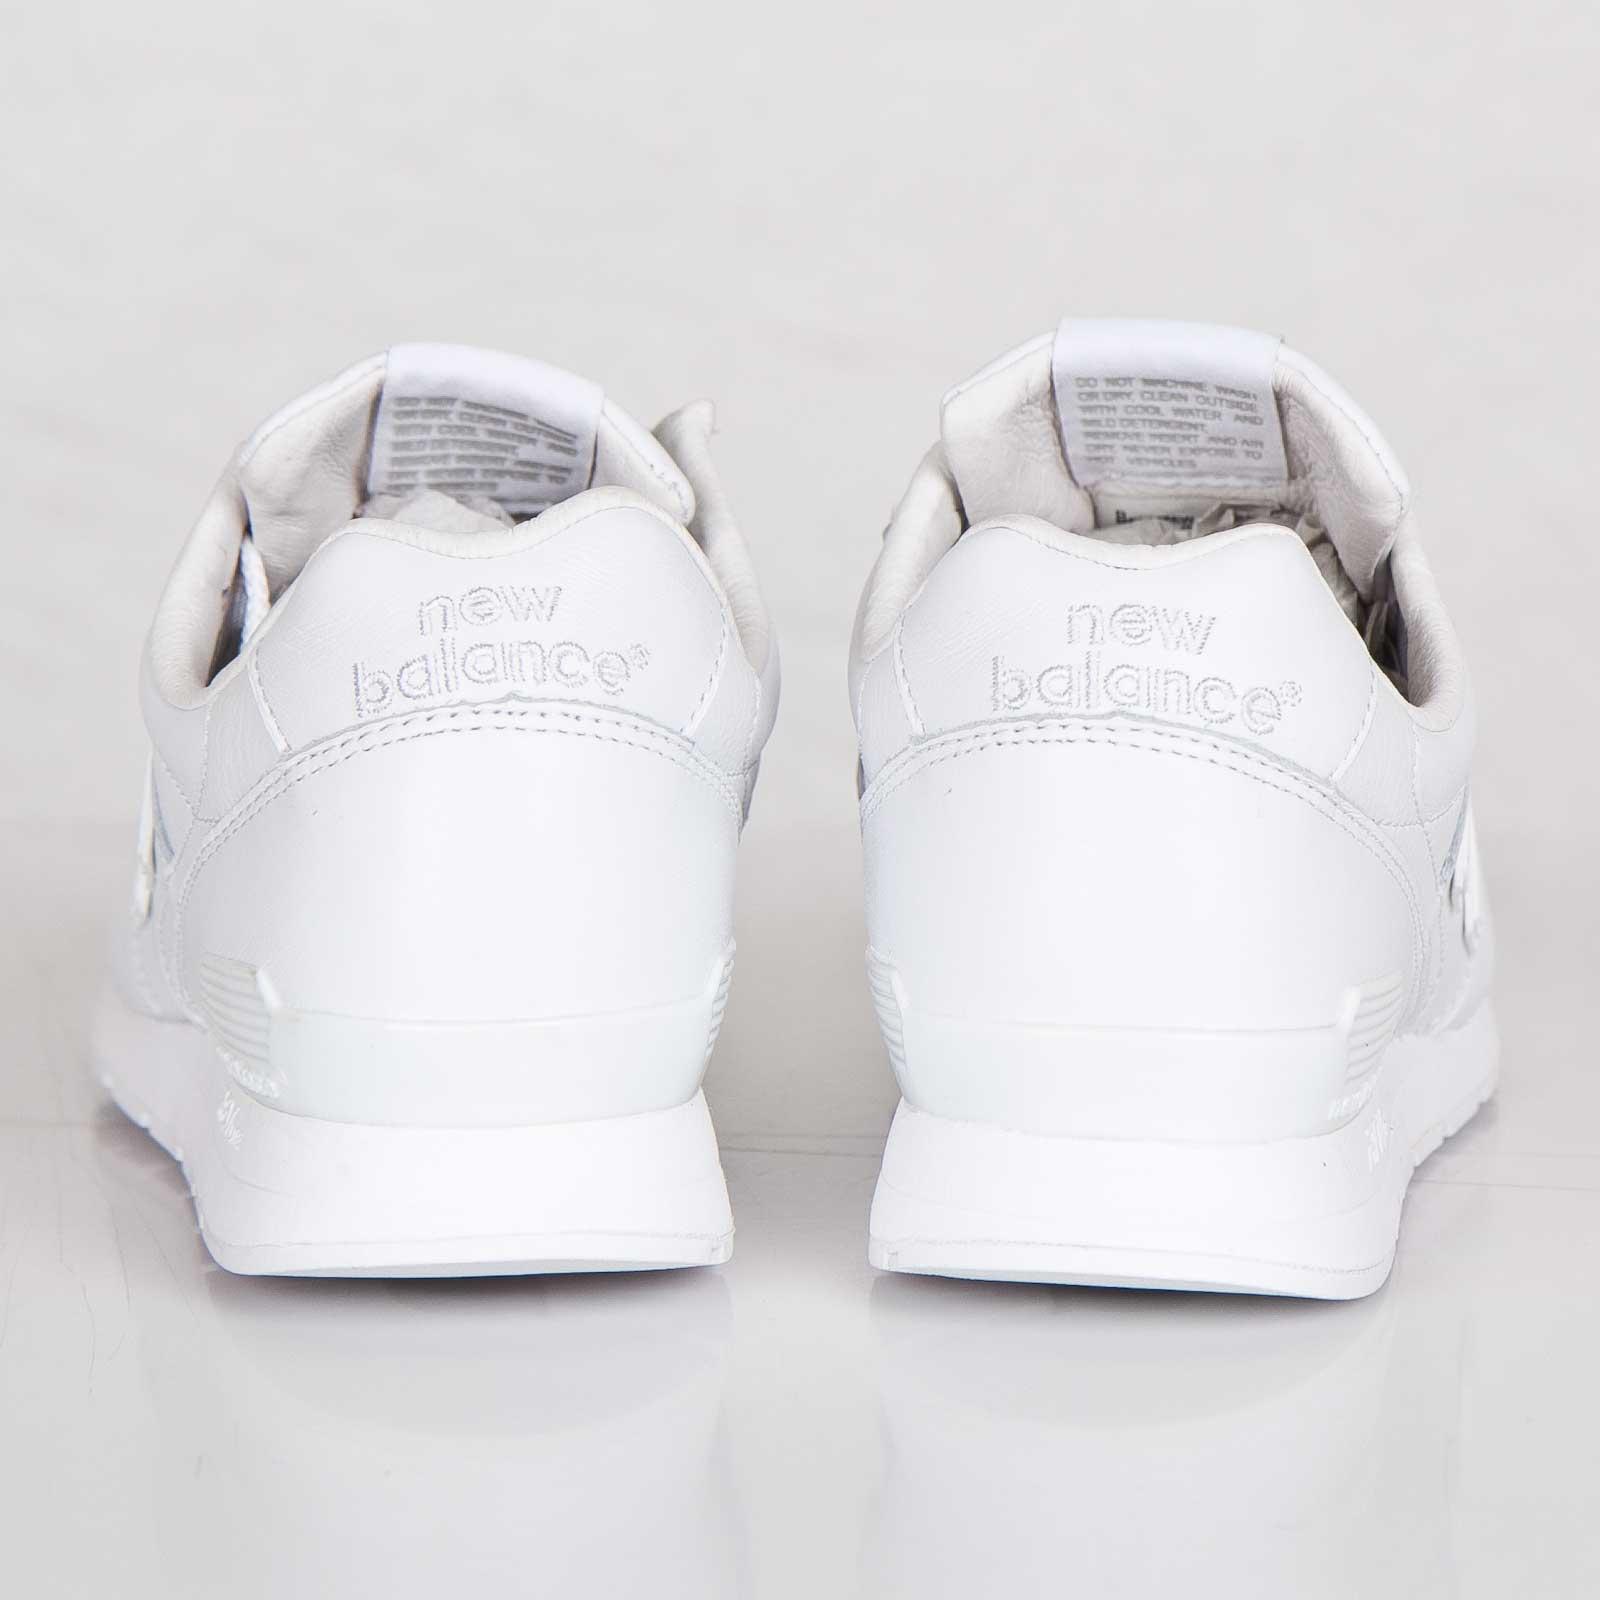 design intemporel ebf3a 31f46 New Balance MRL996EW - Mrl996ew - Sneakersnstuff | sneakers ...